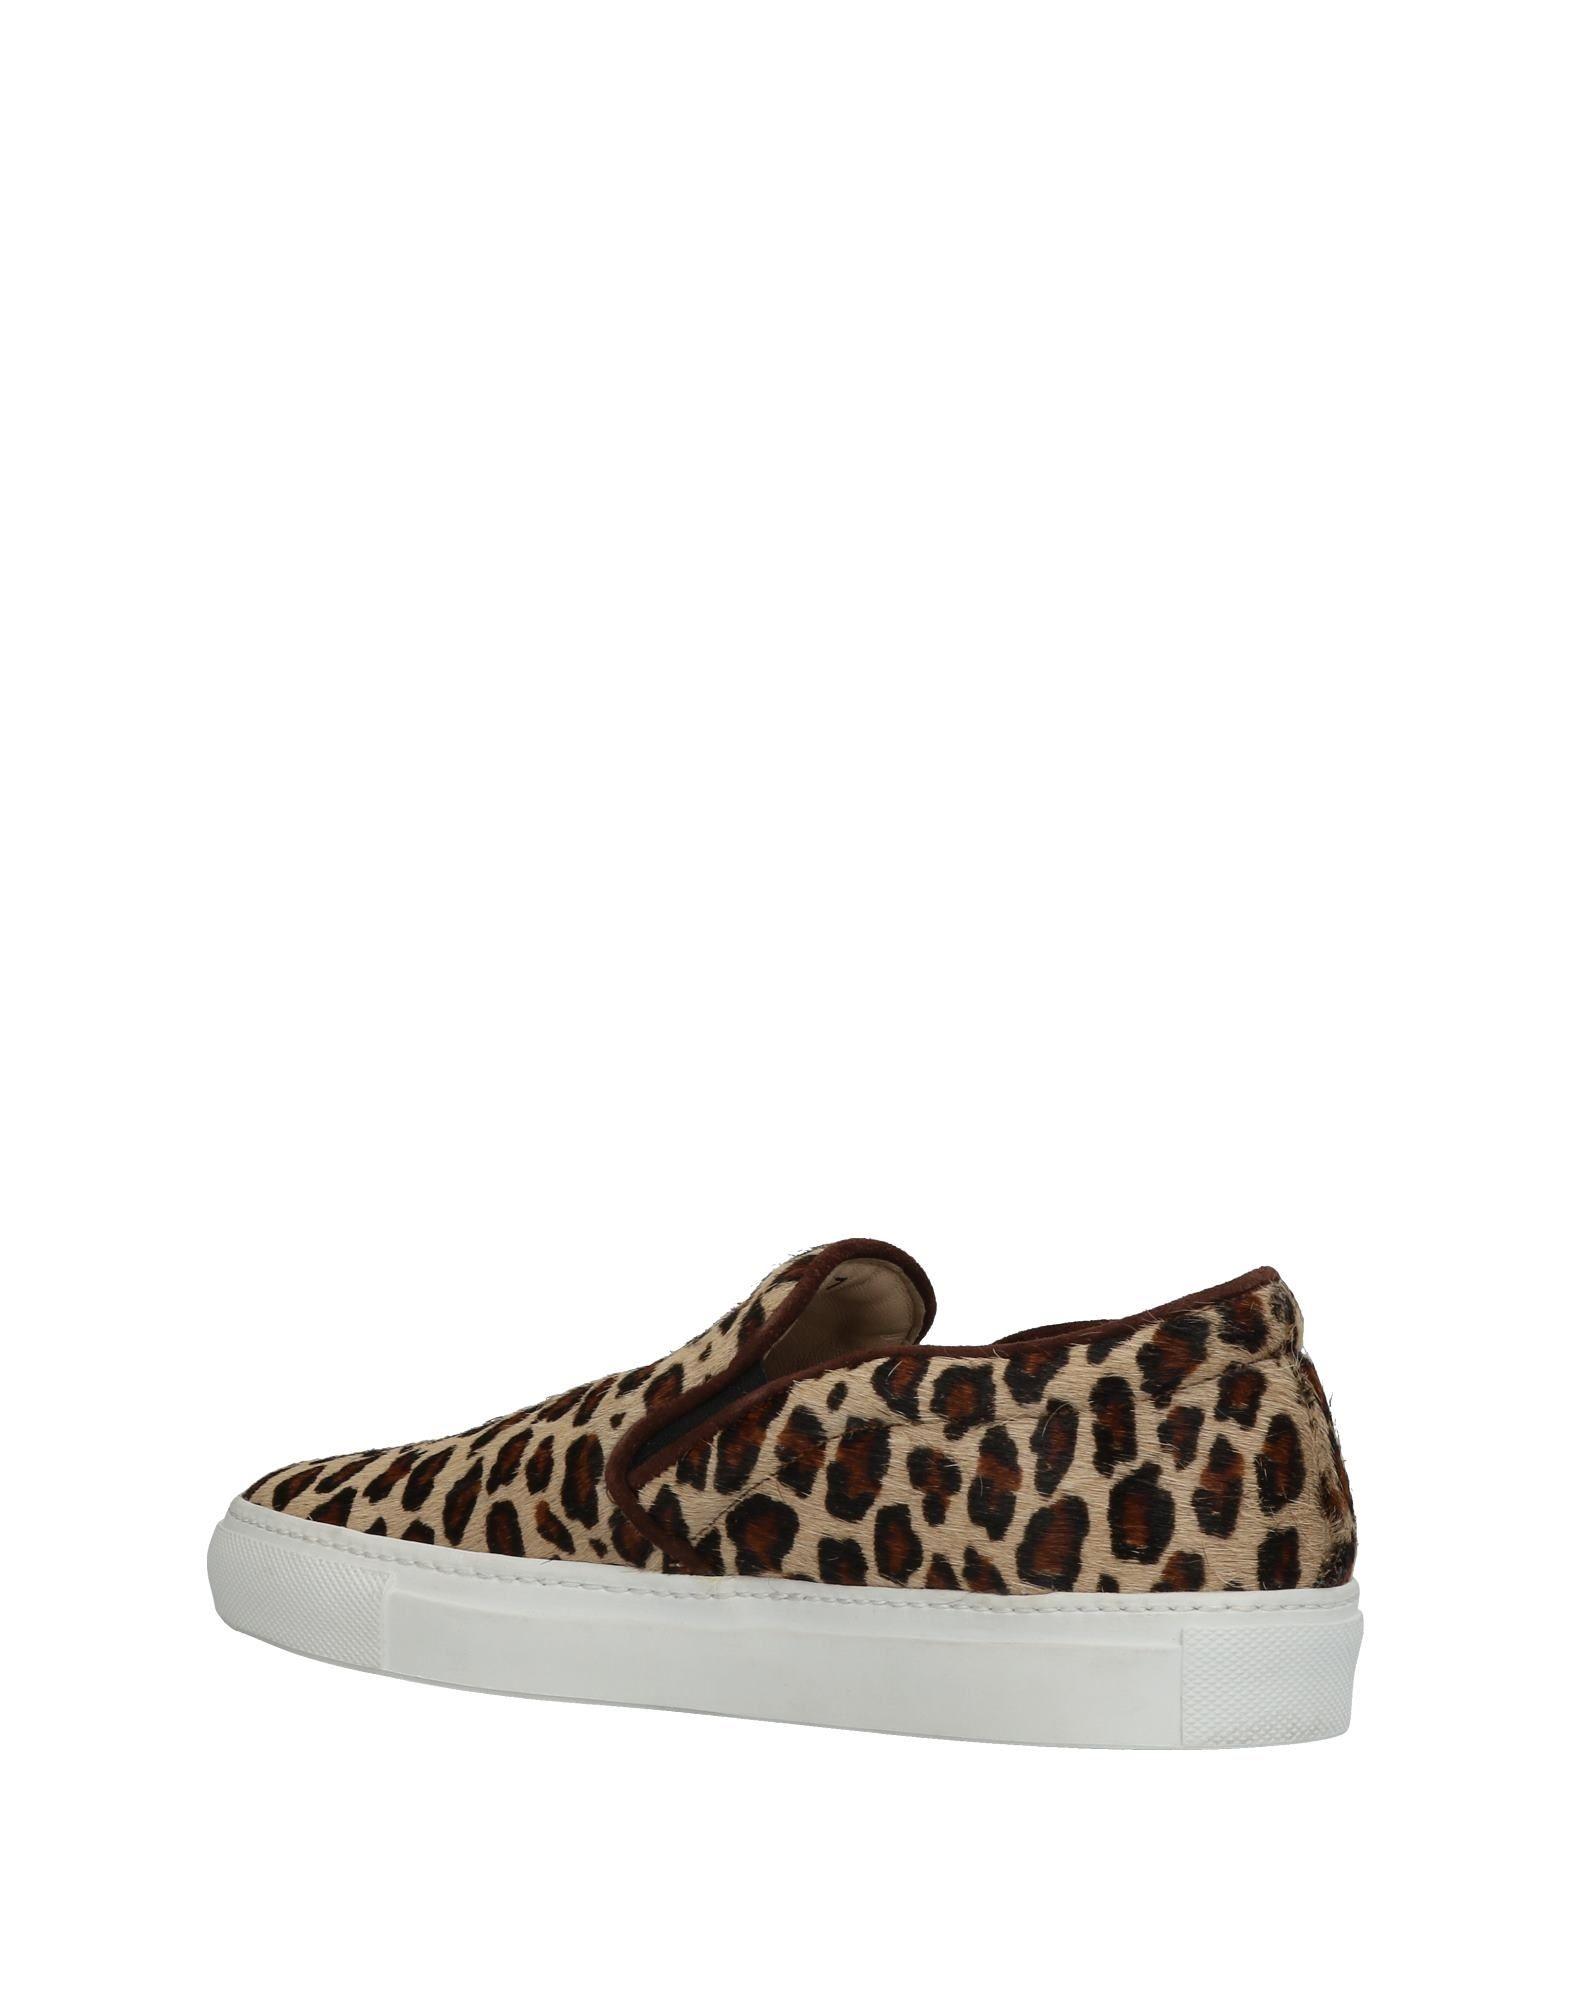 Lara 11446568BO Hampton Sneakers Damen  11446568BO Lara Gute Qualität beliebte Schuhe 90e403